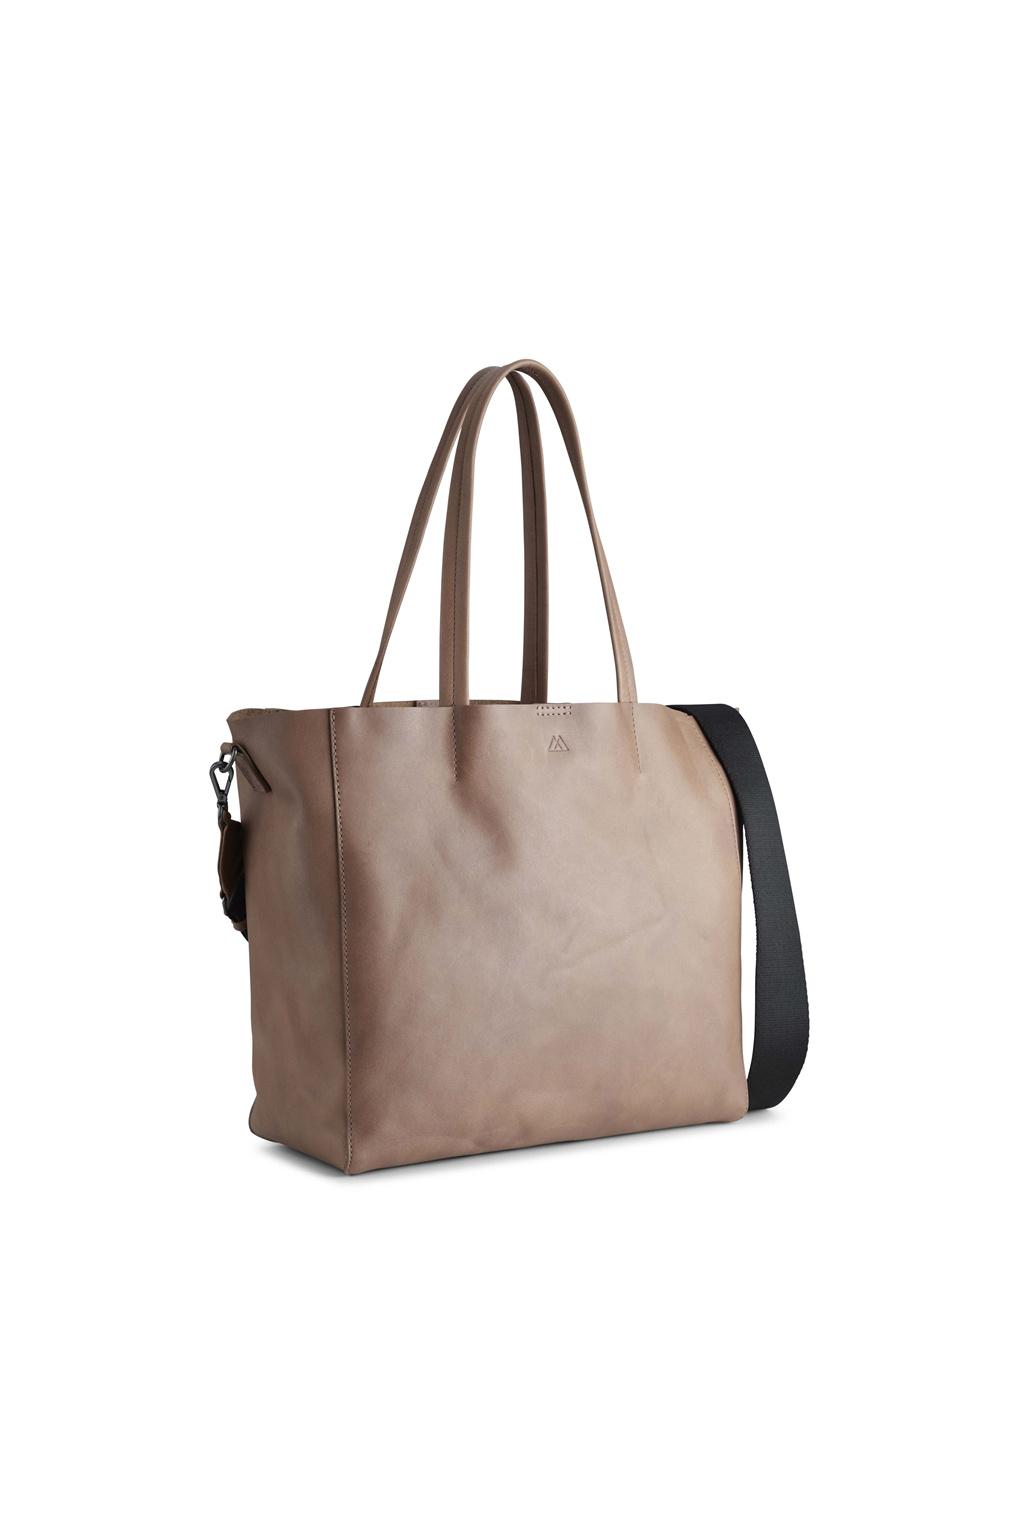 Reese Shopper Bag - Antique Caramel w/ Black-2